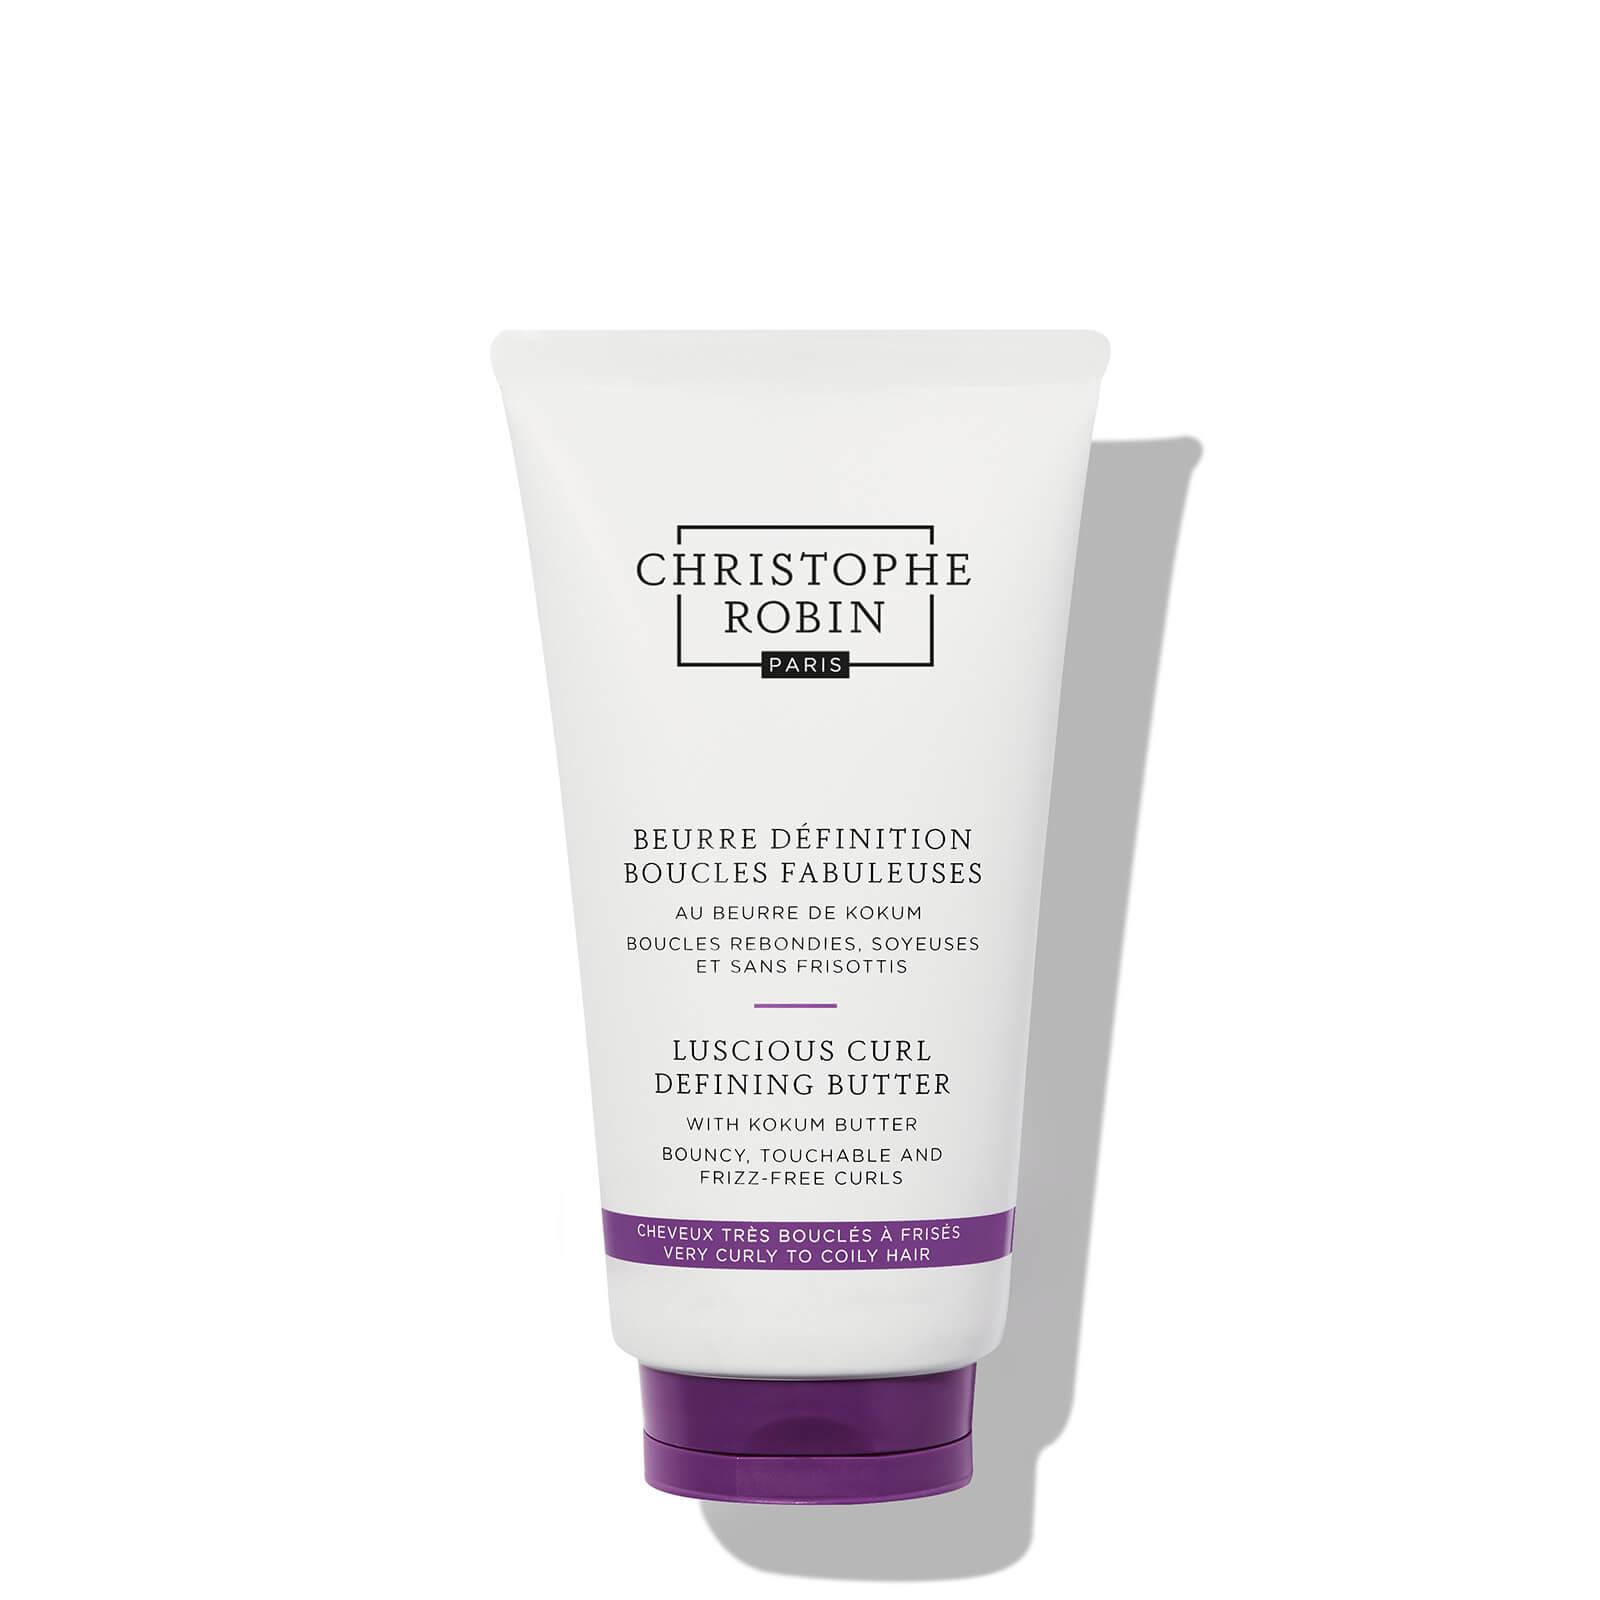 Купить Christophe Robin New Luscious Curl Butter 150 ml